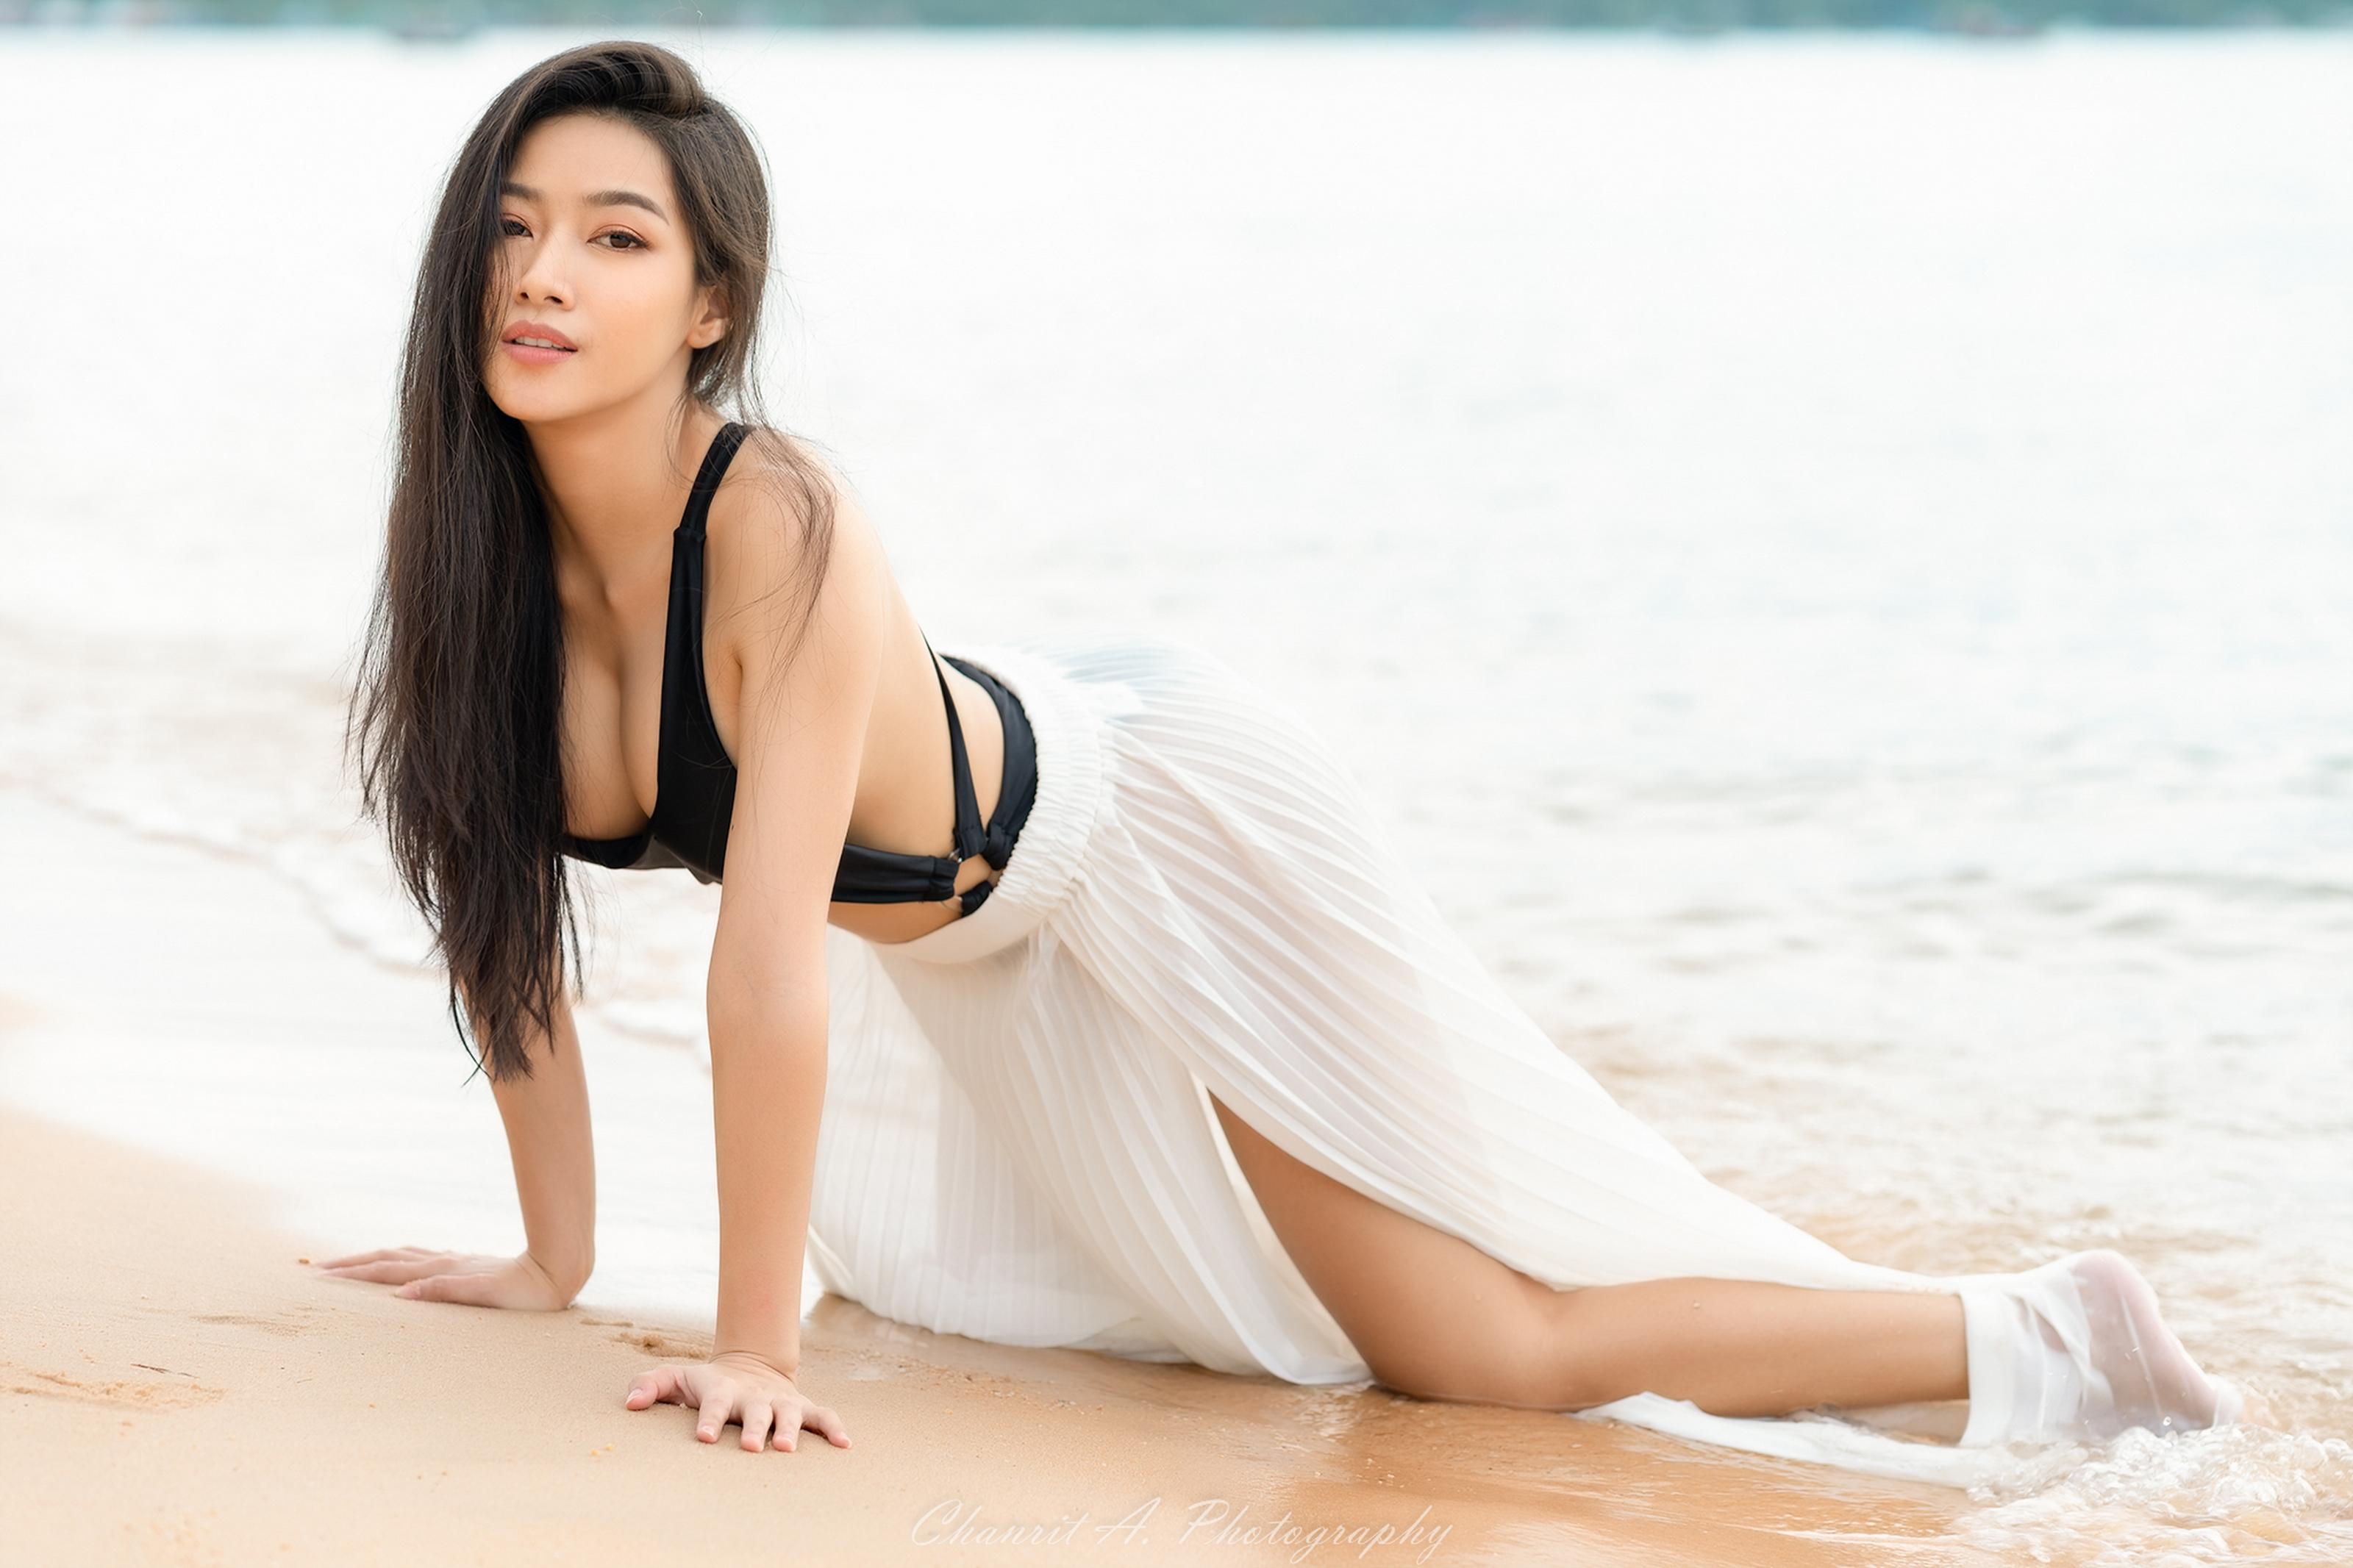 https://get.wallhere.com/photo/Asian-beauty-clothing-emotions-girl-models-people-photography-portrait-sexy-sweetness-wallpaper-woman-1900267.jpg